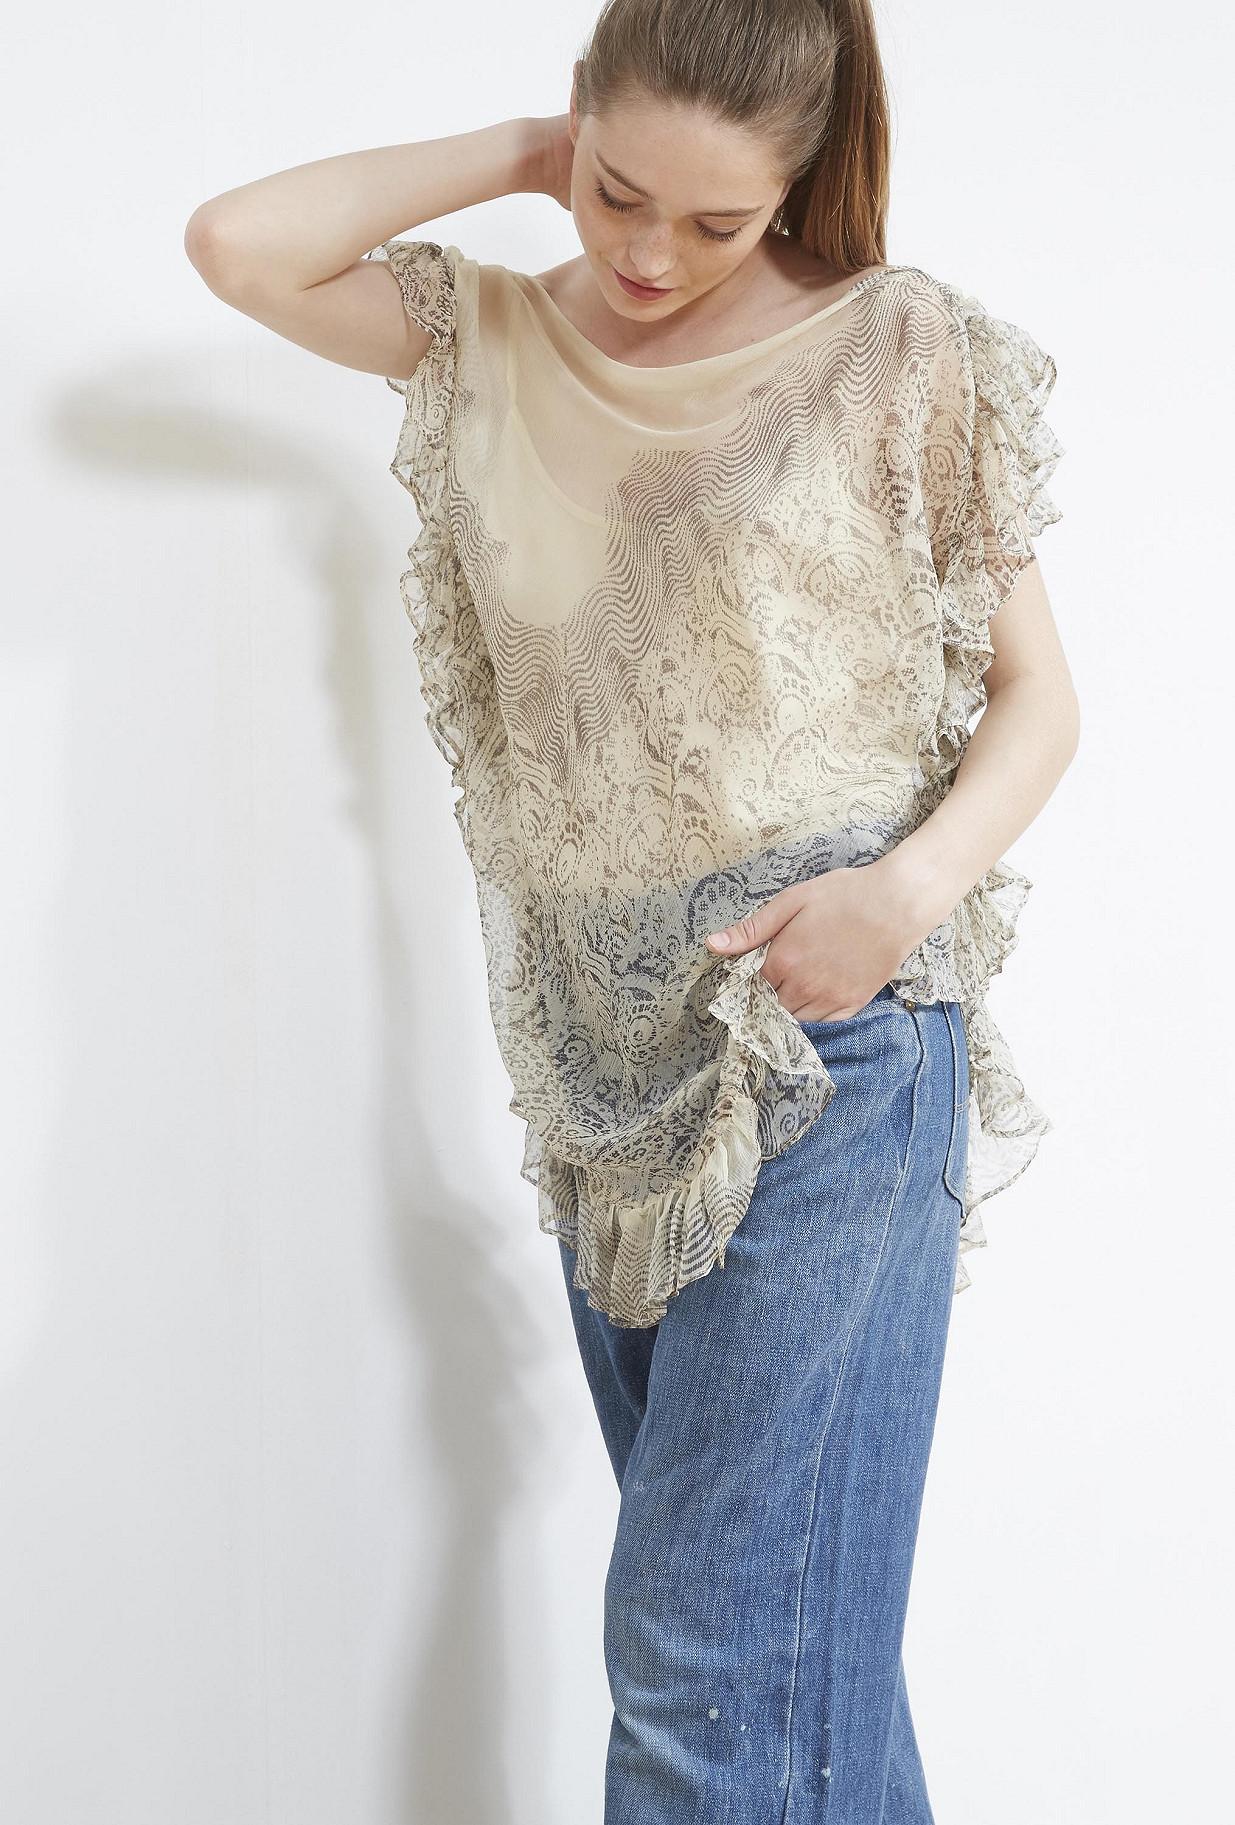 Ecru  SKIRT  Lili Mes demoiselles fashion clothes designer Paris